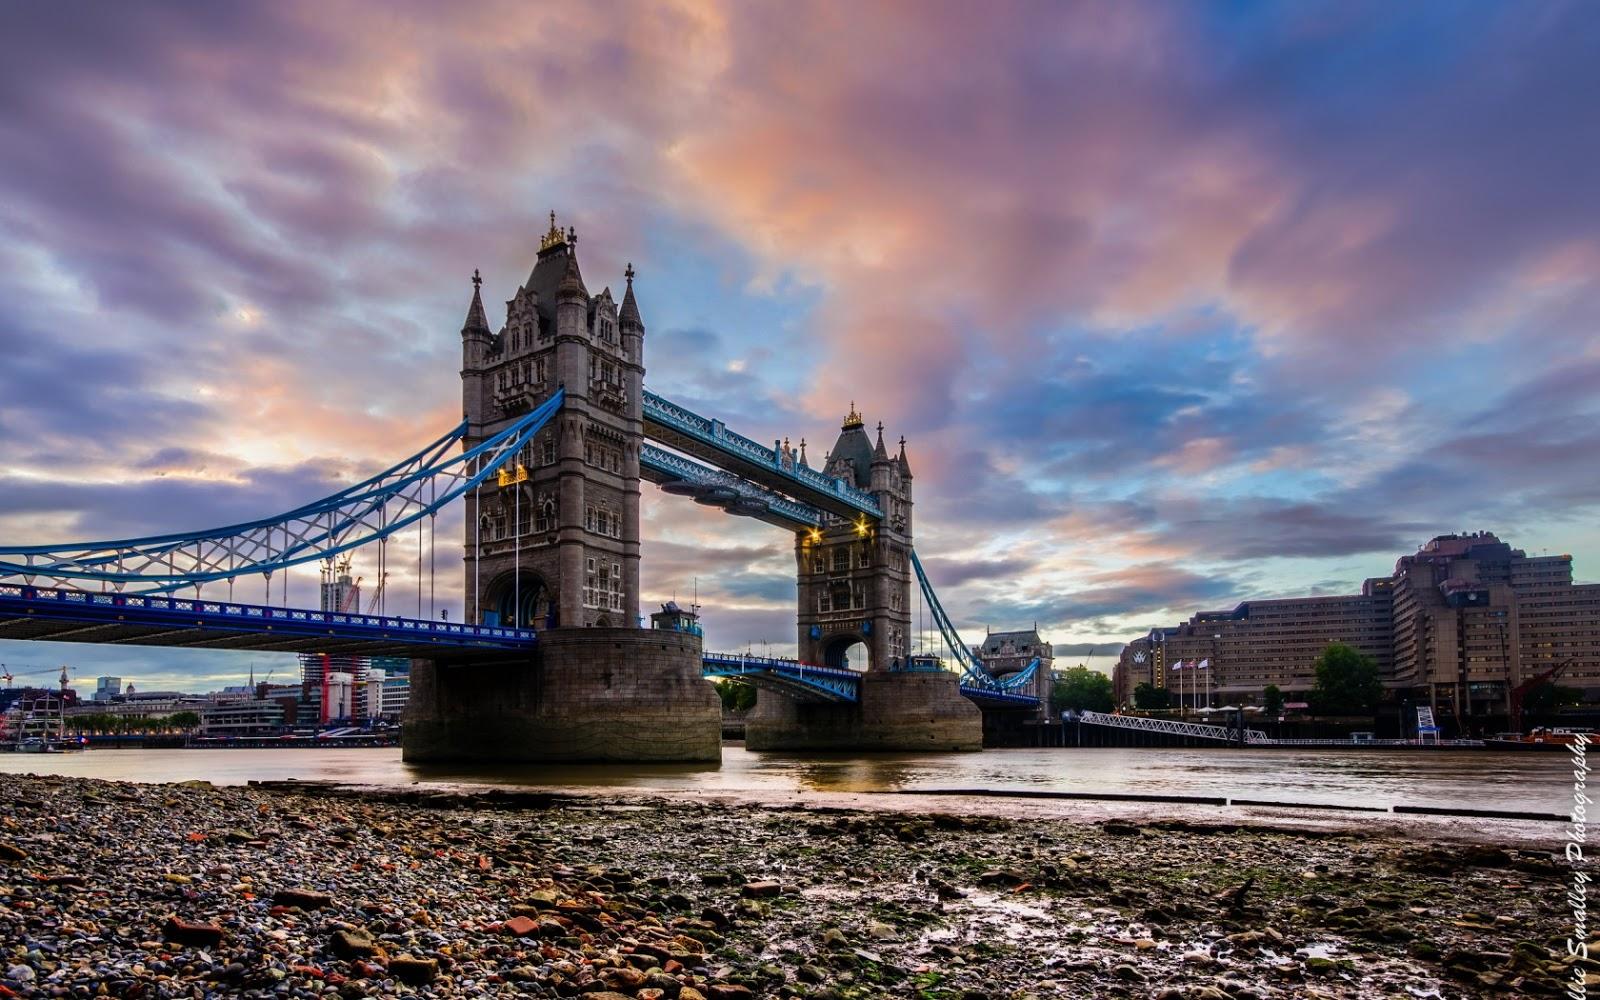 london city wallpapers - photo #33